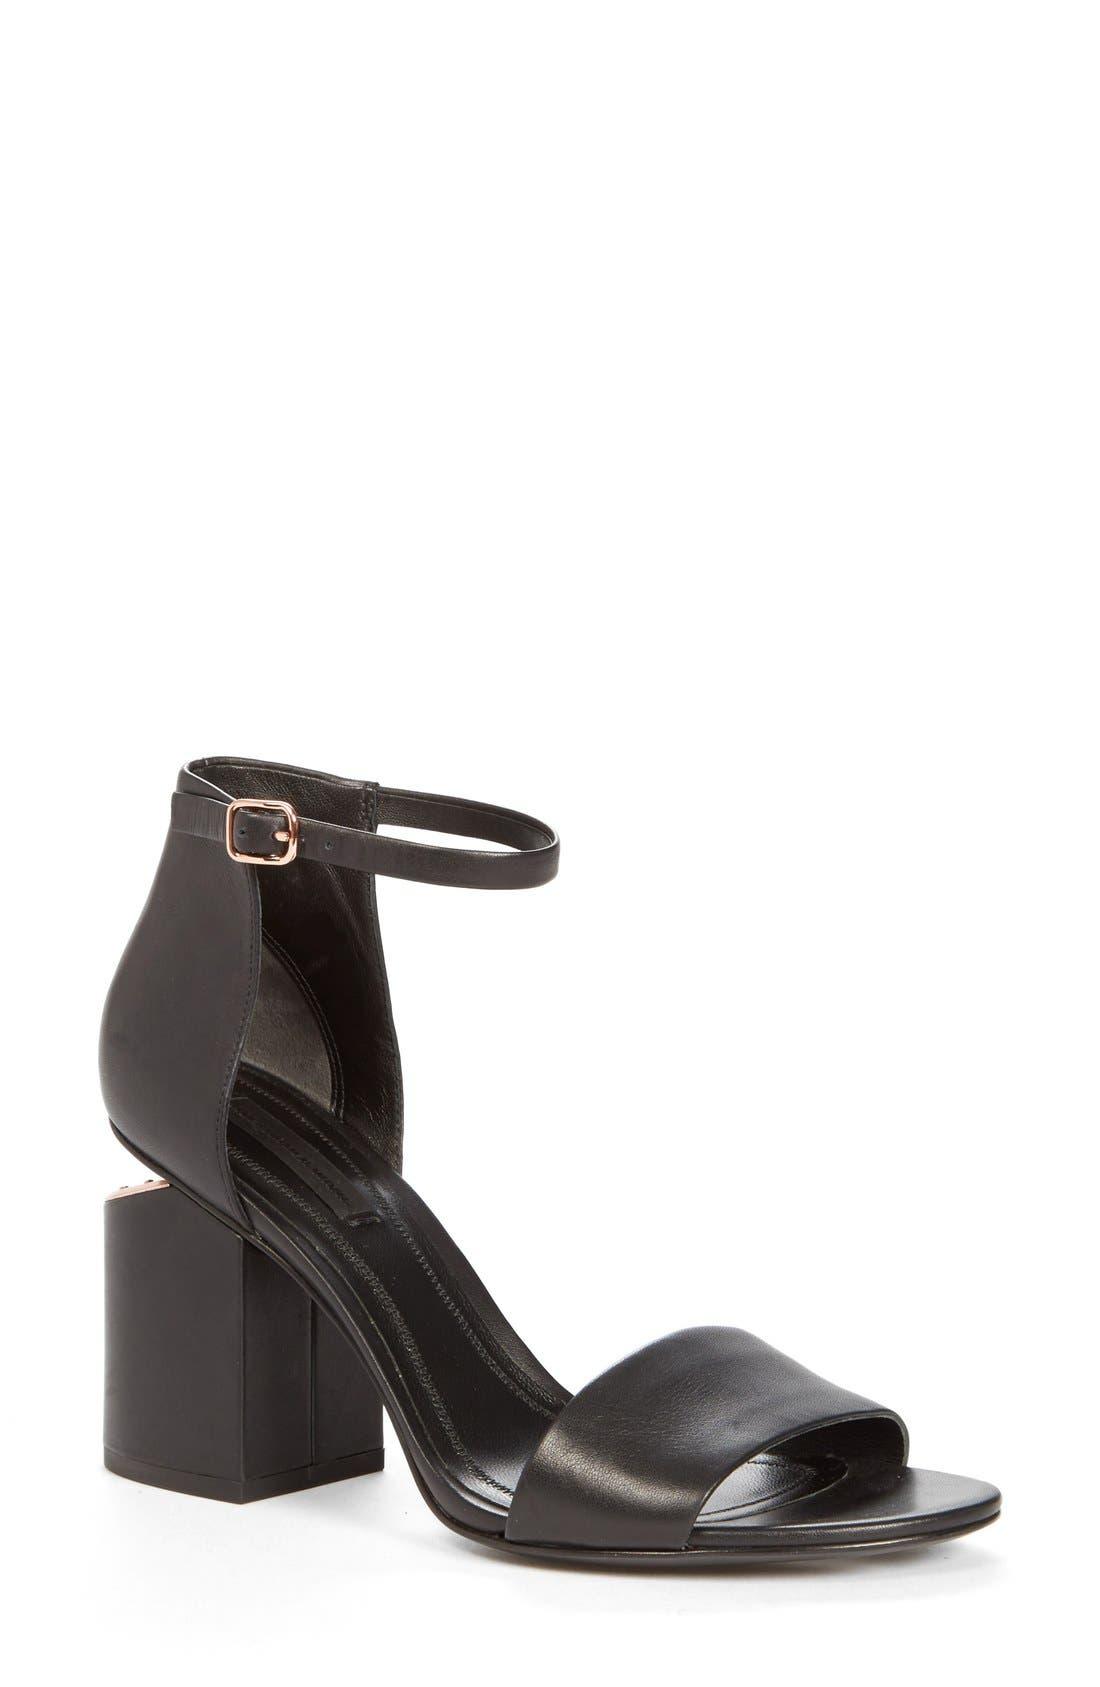 'Abby' Ankle Strap Sandal,                             Main thumbnail 1, color,                             BLACK/ ROSE GOLD